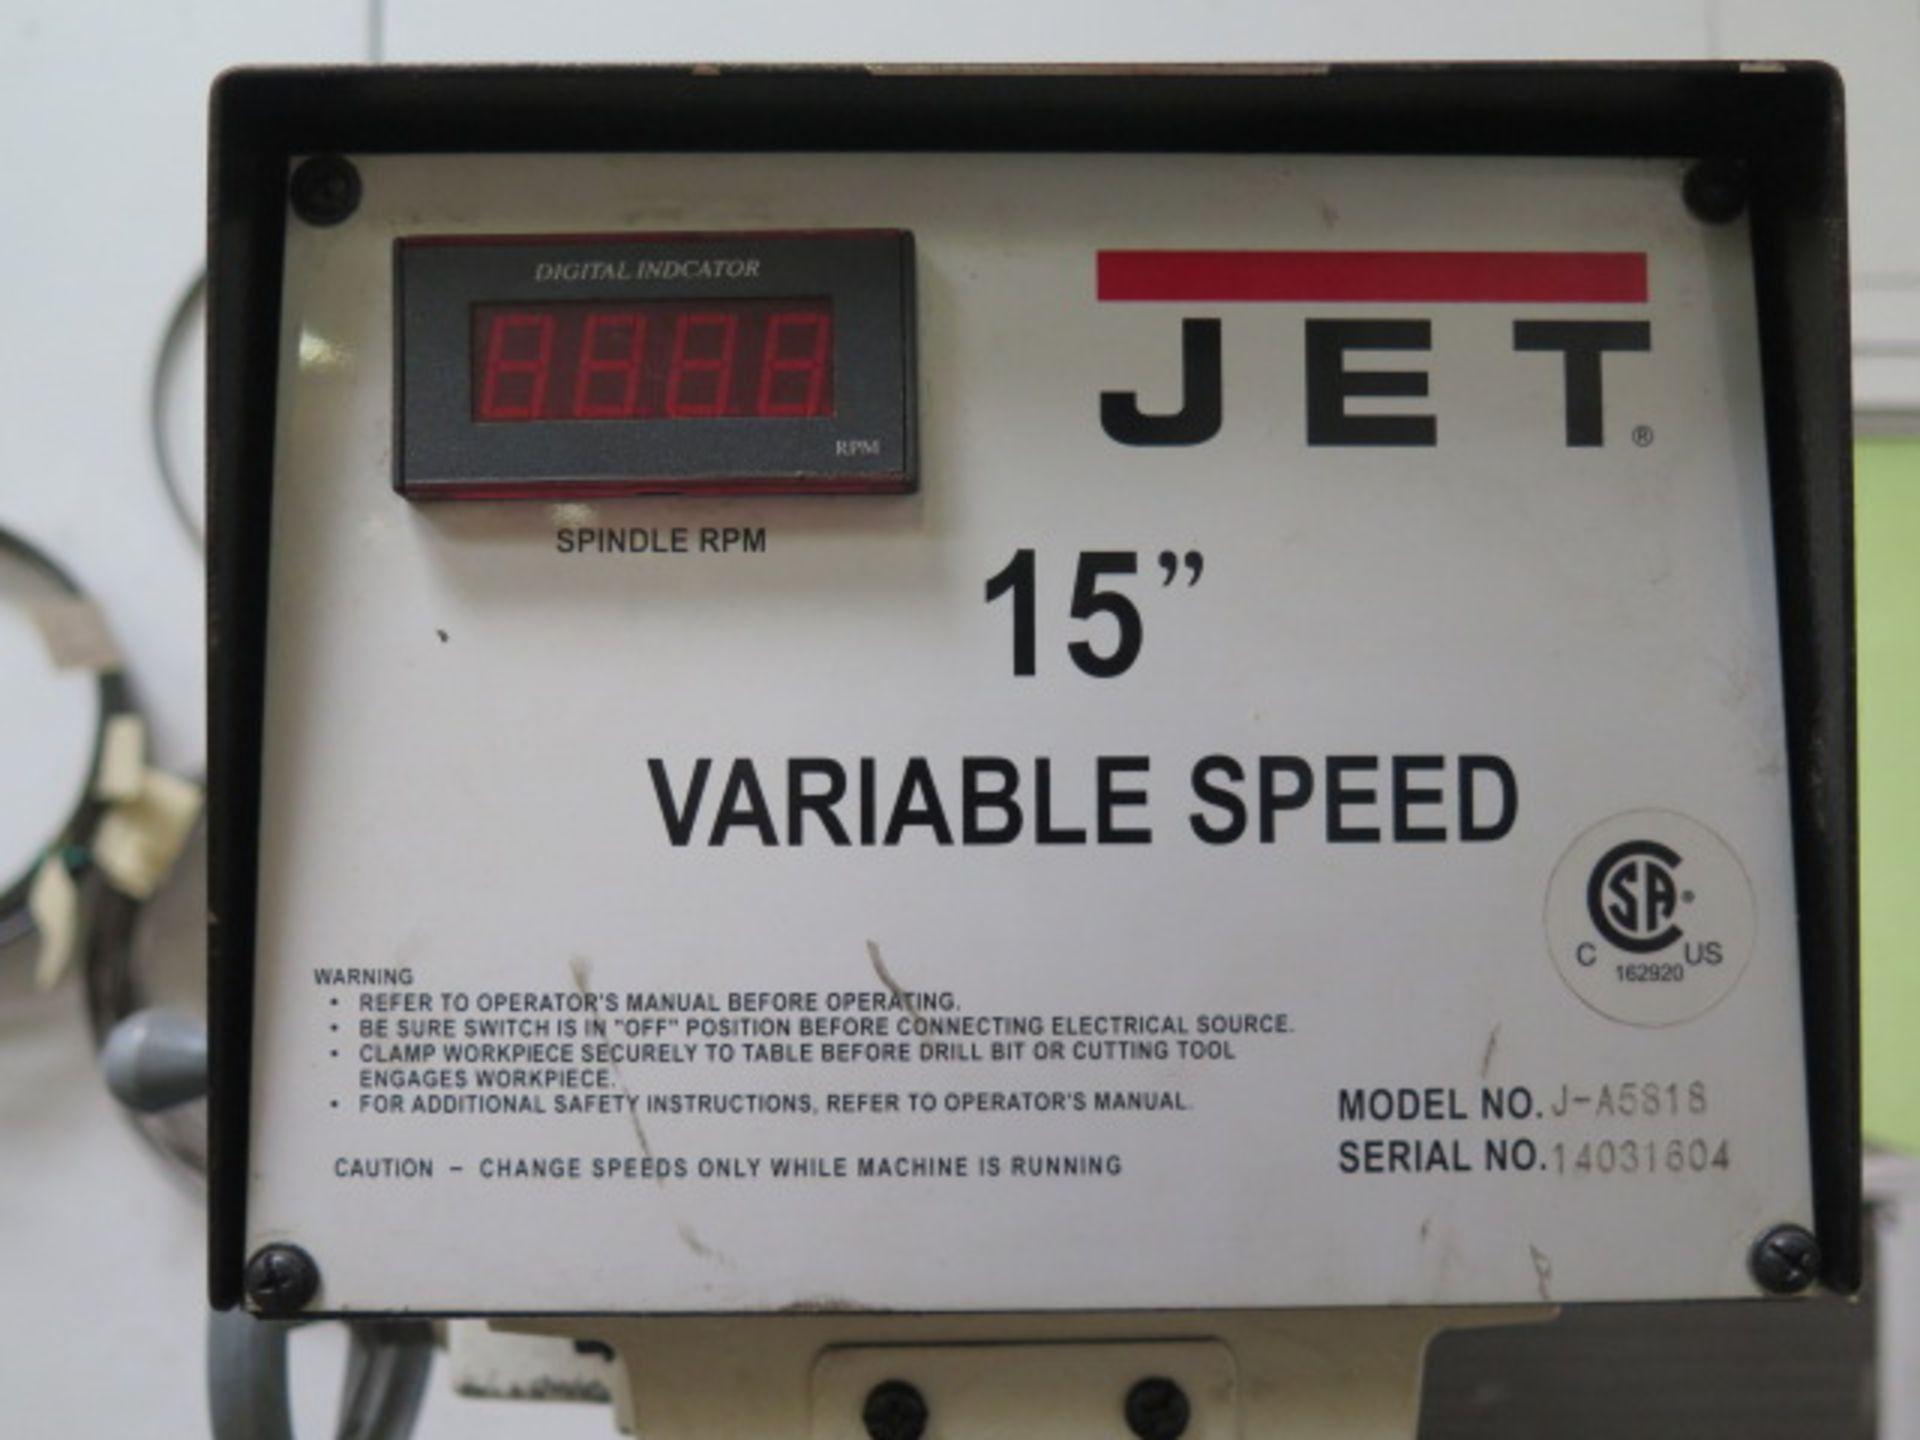 Lotto 41 - Jet mdl. J-A5818 Variable Speed Pedestal Drill Press s/n 14031604 w/ Dial Change RPM, Digital